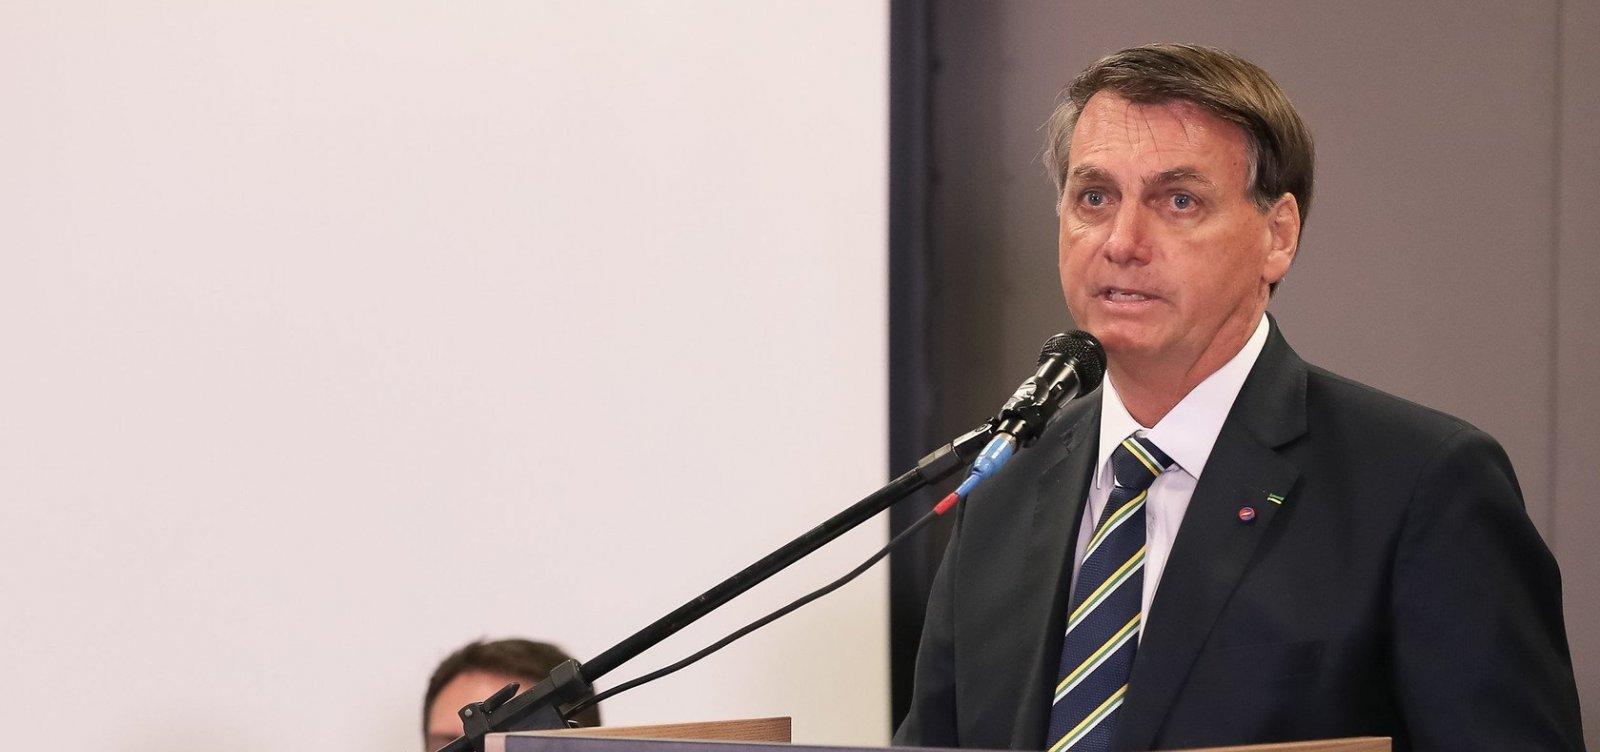 [Política ambiental do governo Bolsonaro já prejudica empresas brasileiras]